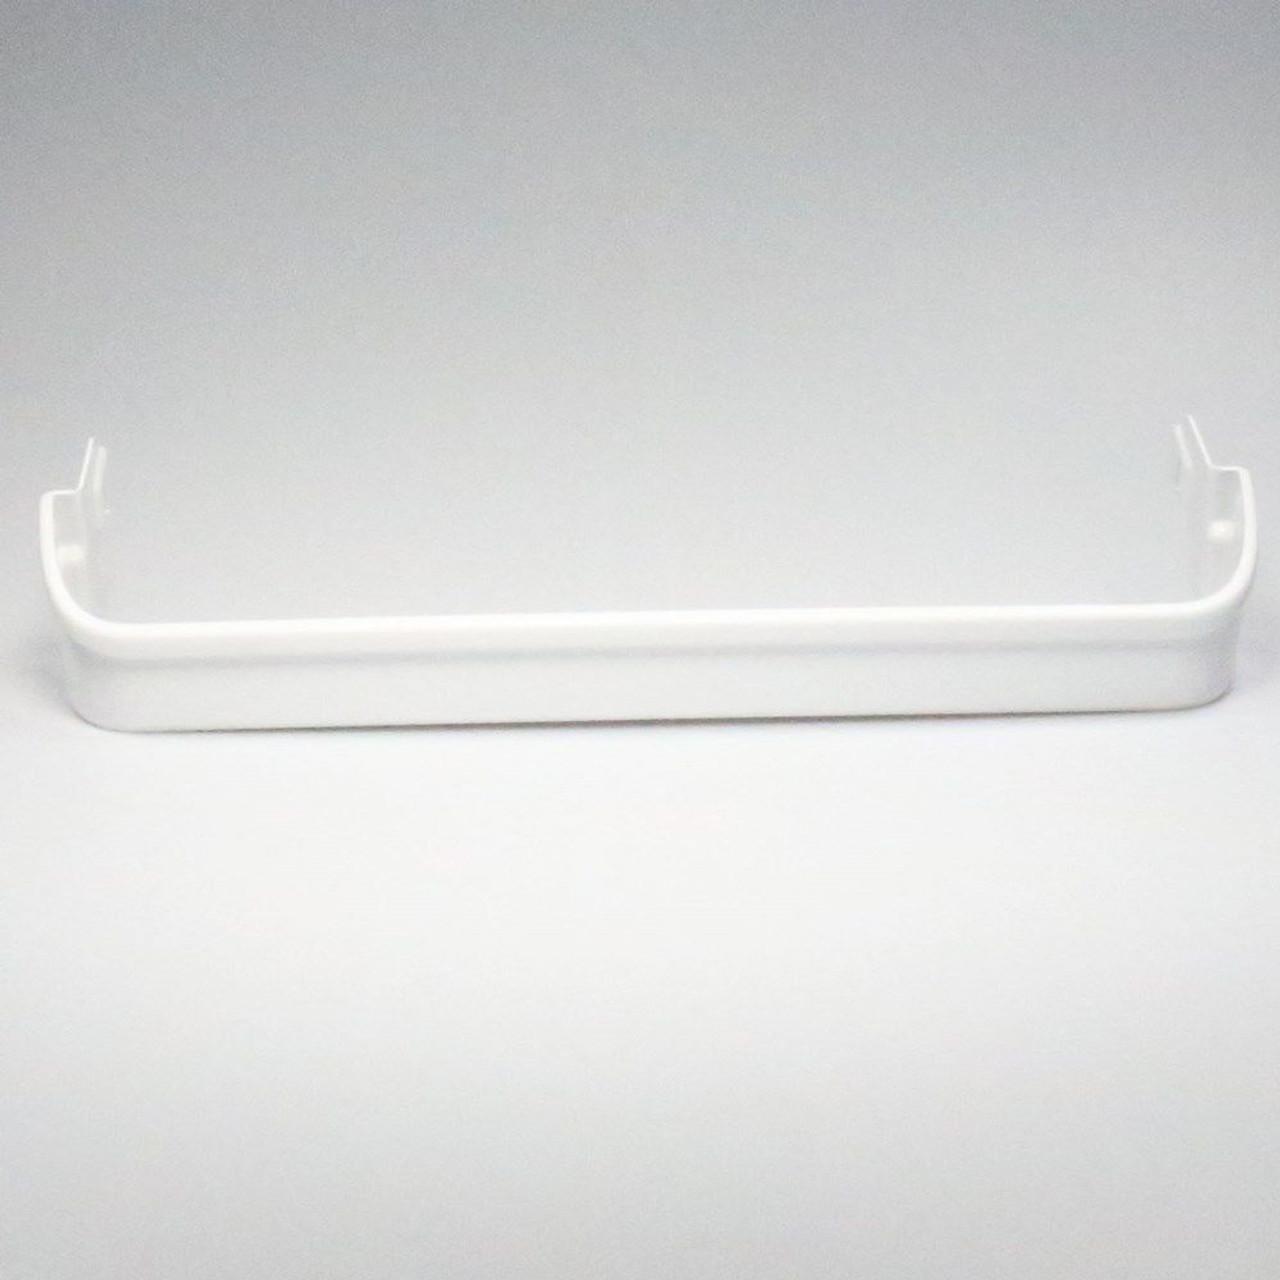 Compatible Door Bin Shelf for Frigidaire FRT21HS6JS0 Frigidaire FRT21IL5DW2 Frigidaire FRT21IS6BQ3 Frigidaire FRT21IS6JW3 Refrigerators